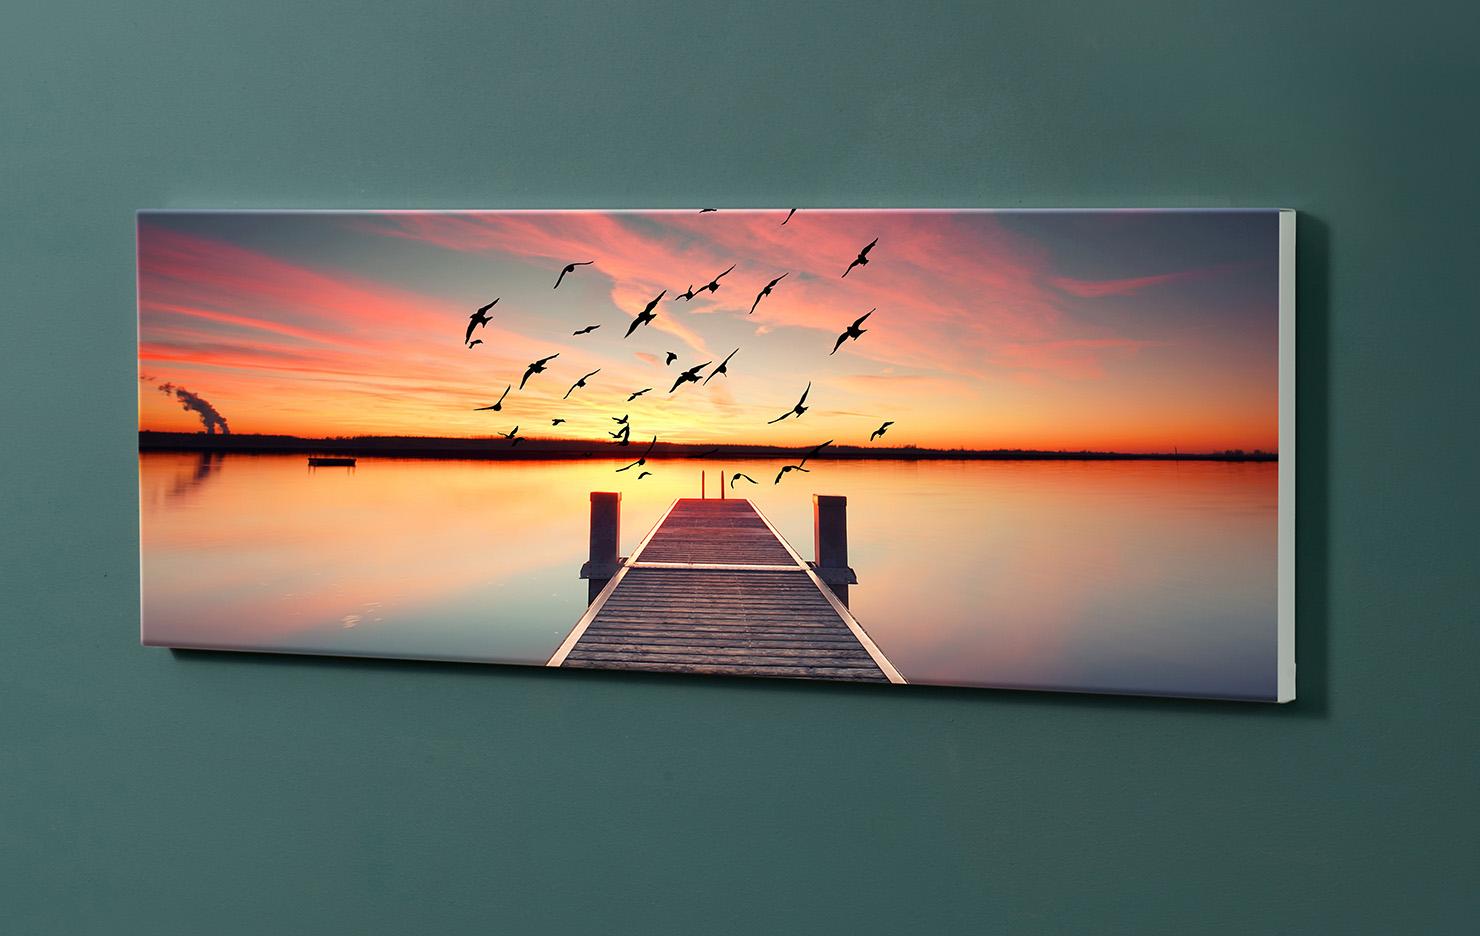 Magnettafel NOTIZ 90x30cm Motiv-Pinnwand M100 Steg Sonnenuntergang